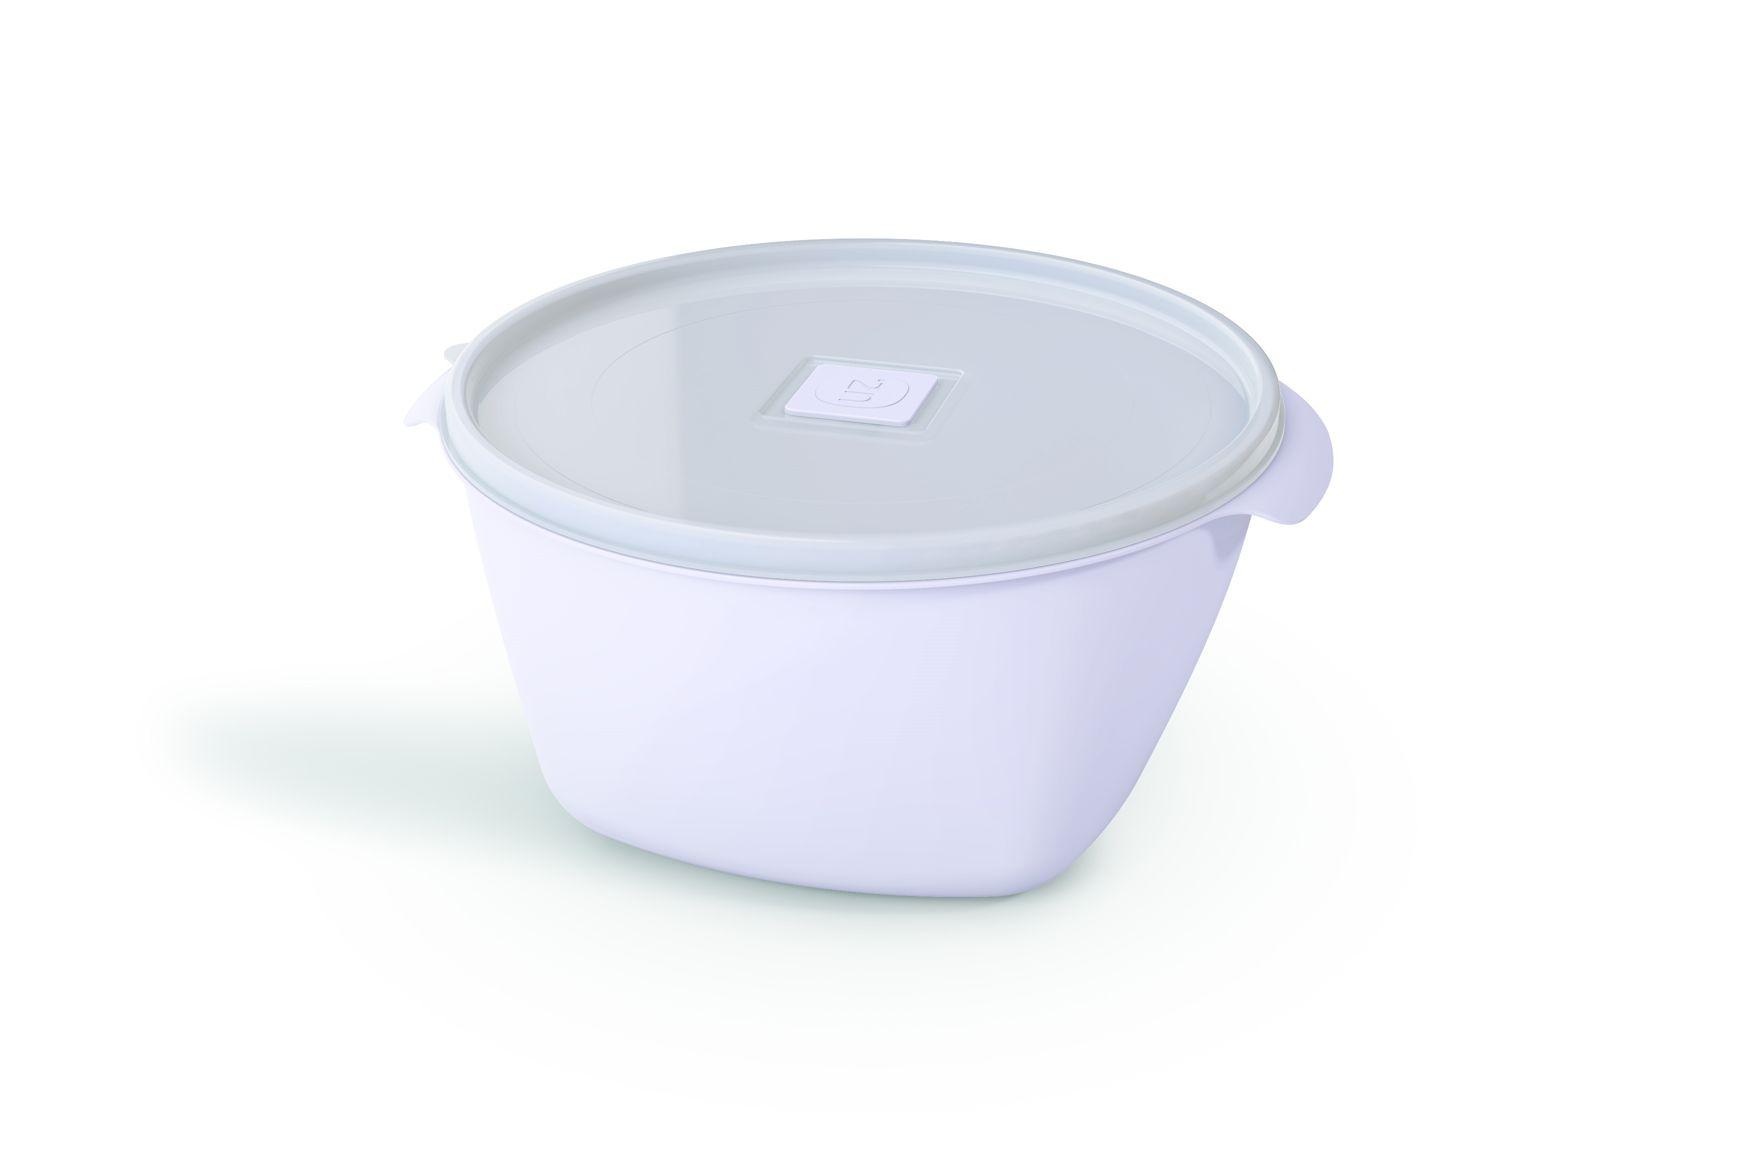 Pote Plástico 2,0 L Premium Branco